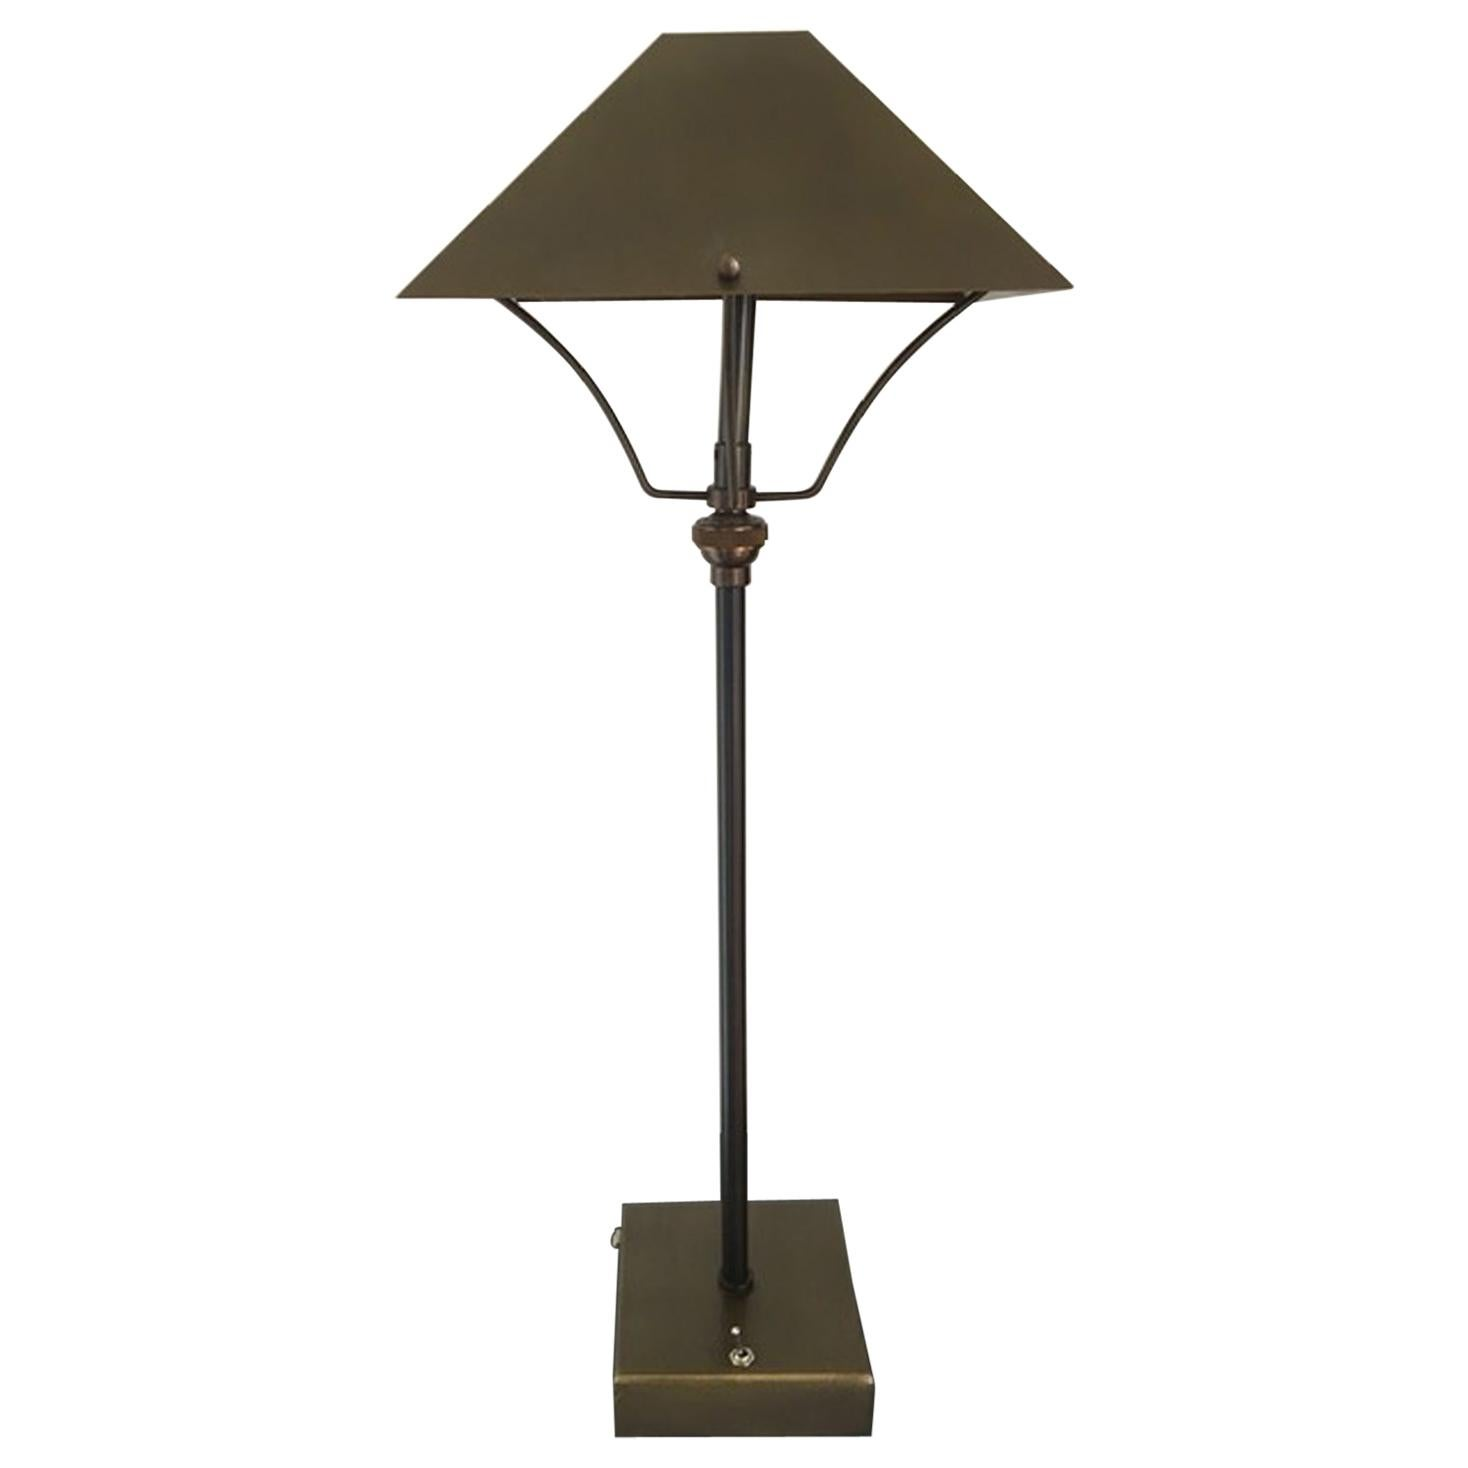 21st Century Italian Design Burnished Brass Cordless Table Lamp